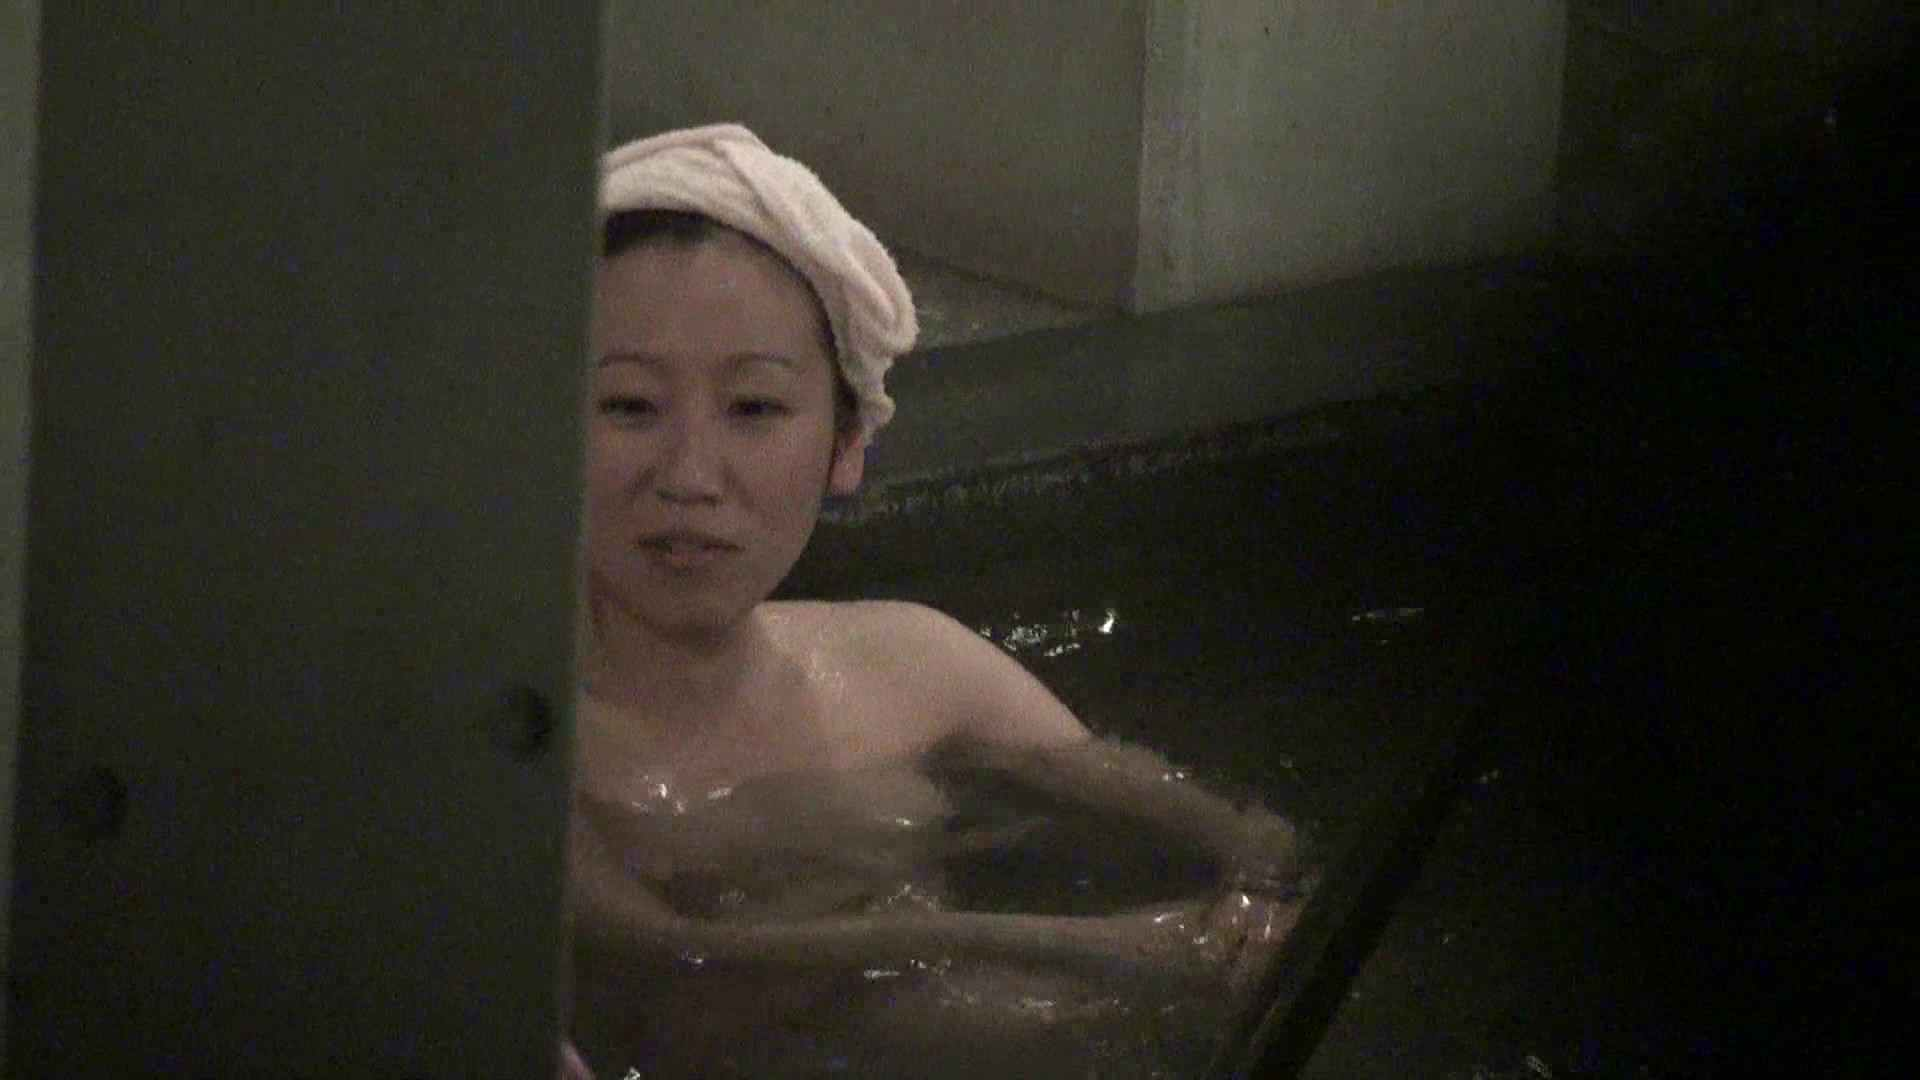 Aquaな露天風呂Vol.416 0 | 0  106連発 37